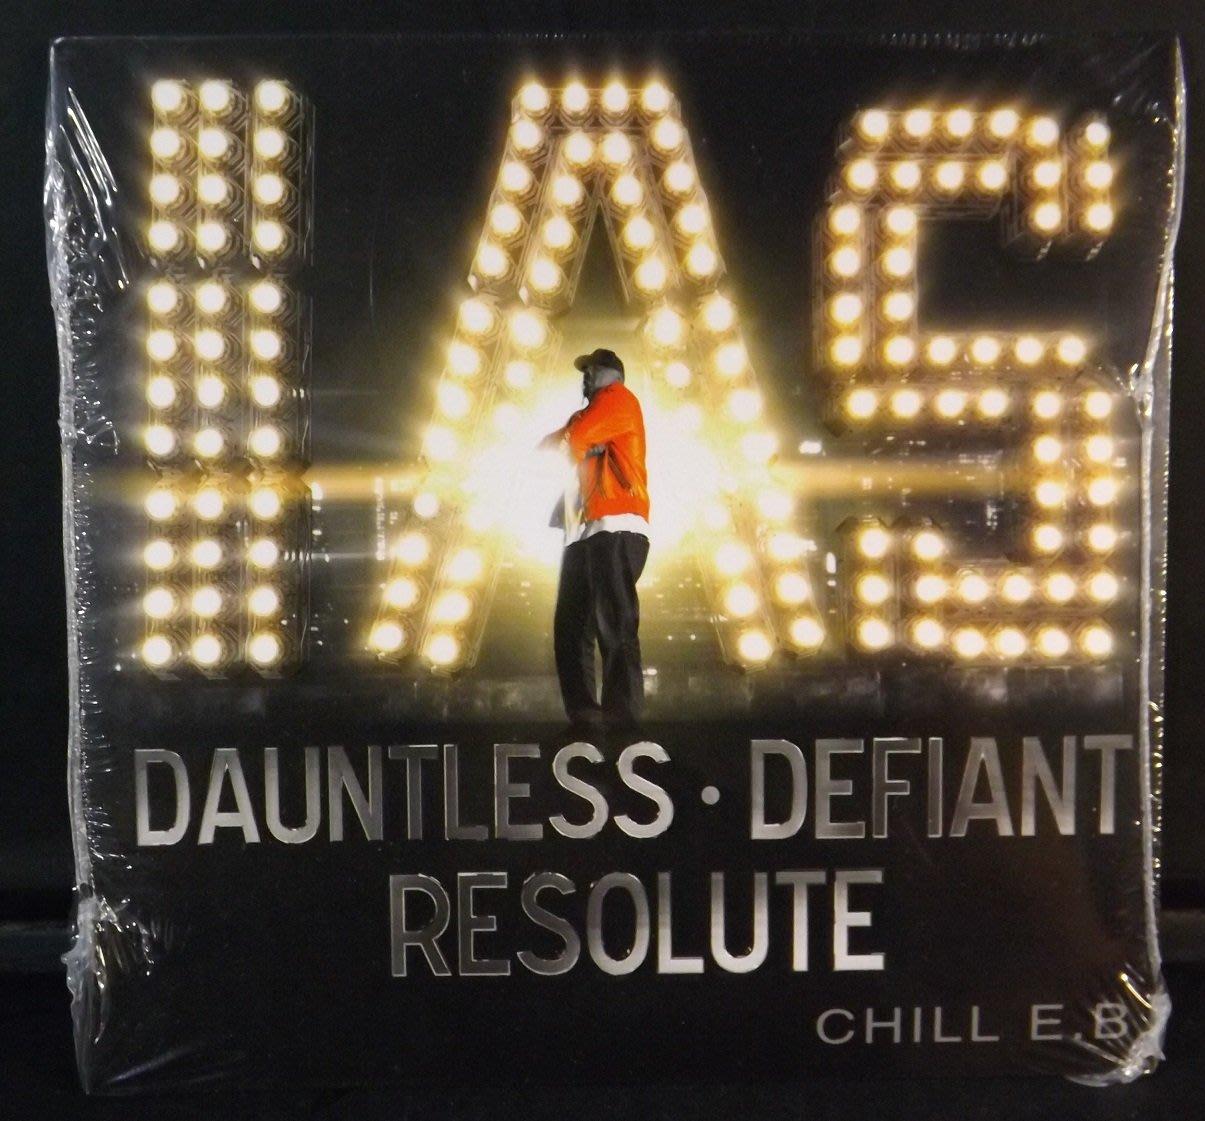 CD CHILL E.B-DAUNTLESS.DEFIANT RESOLUTE~新品~10HJ29C05~